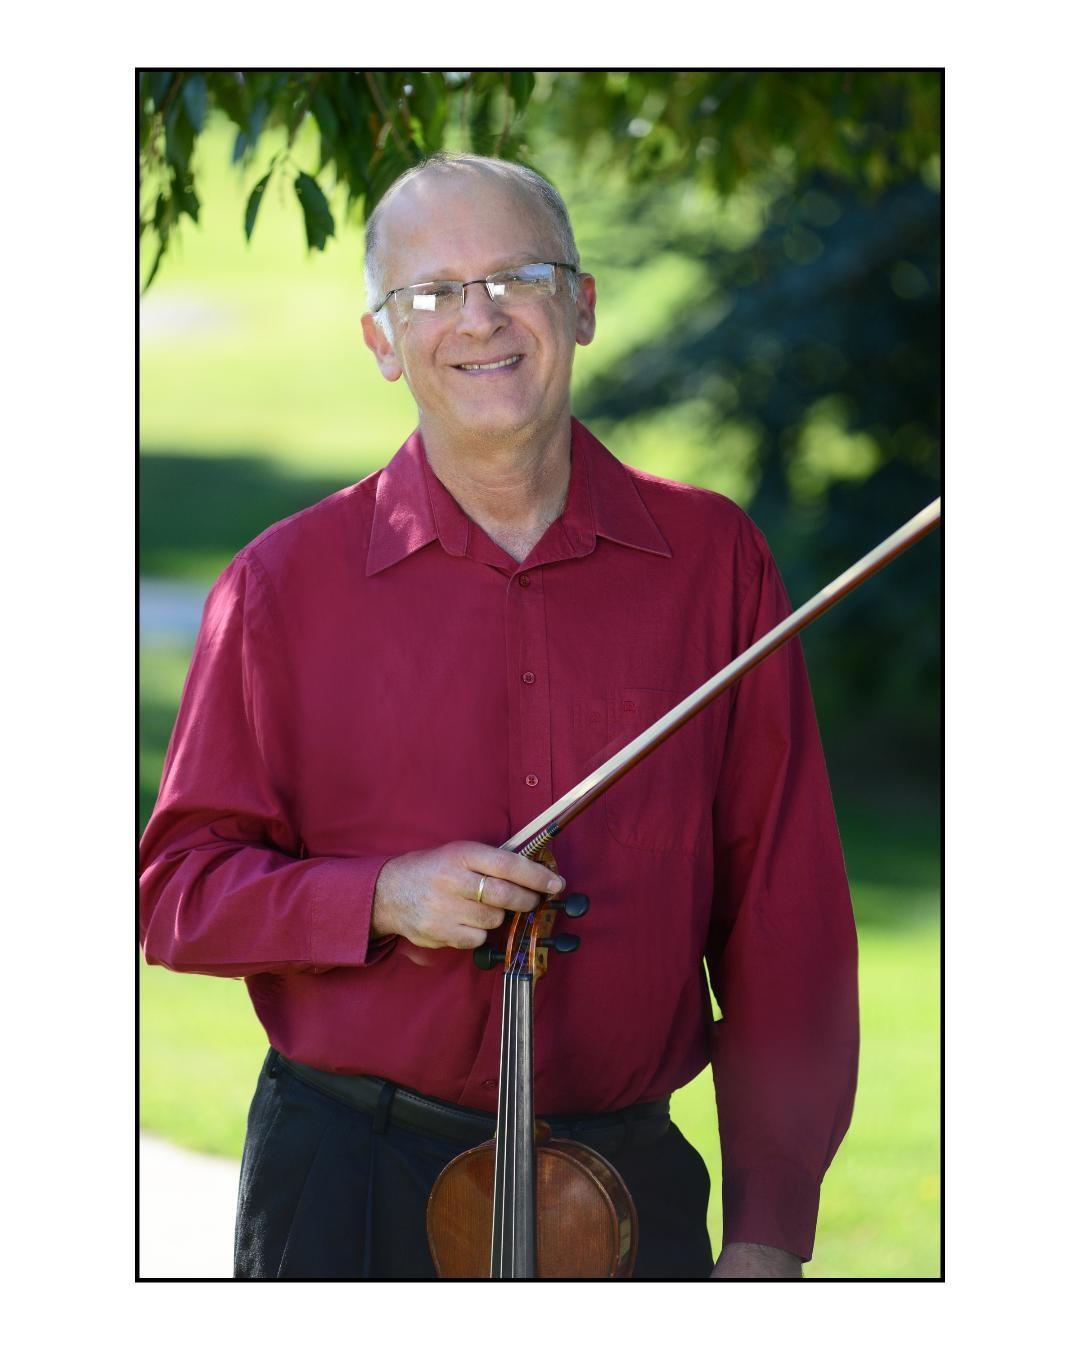 three quarter length portrait of Eliezer Gutman holding his violin outside